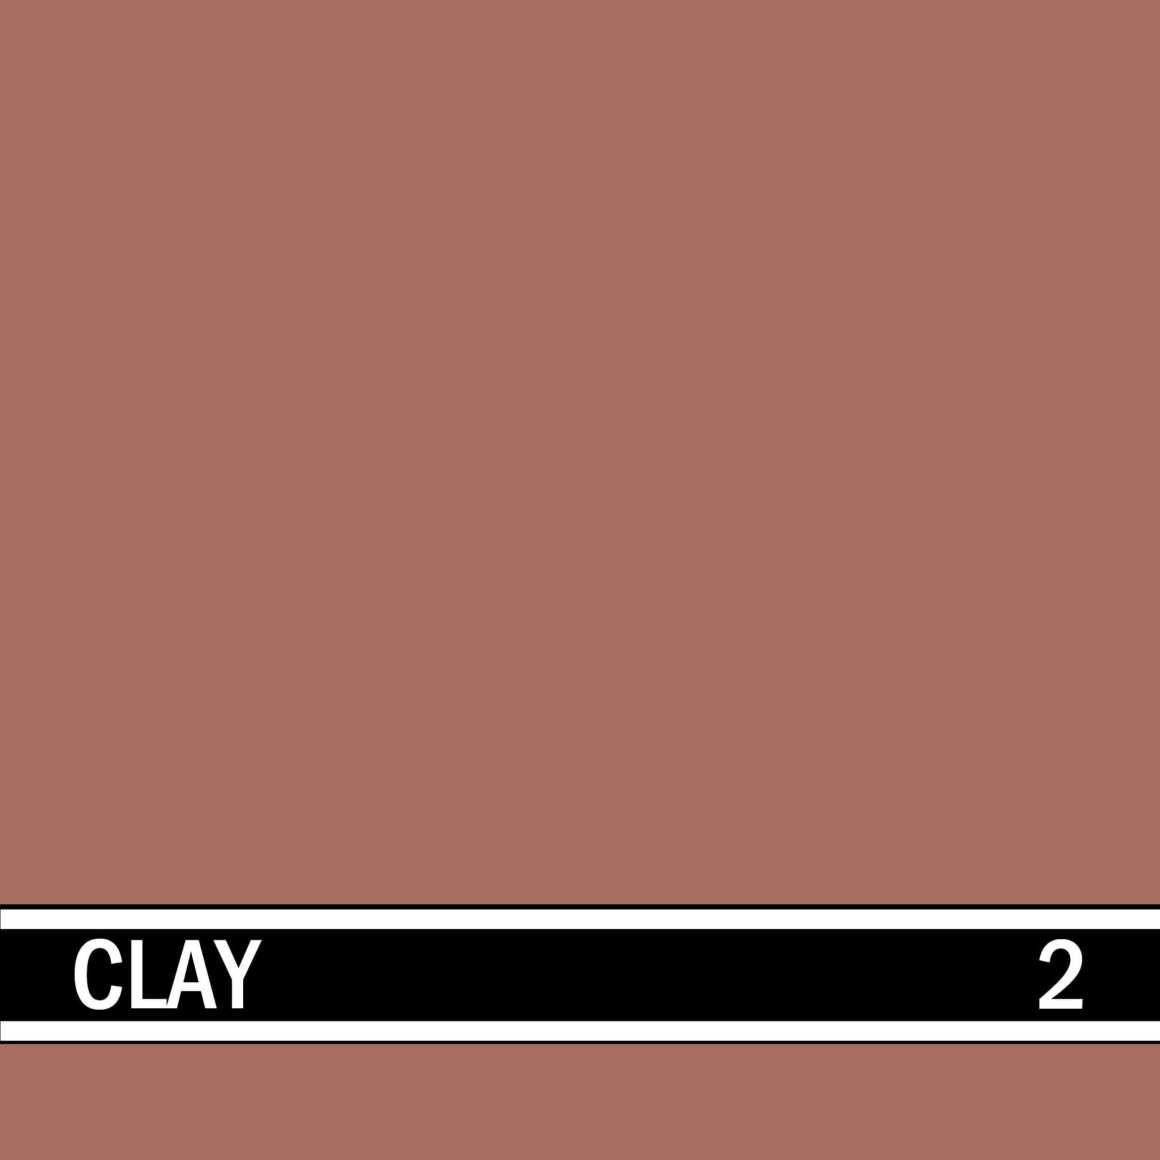 Clay integral concrete color for stamped concrete and decorative colored concrete